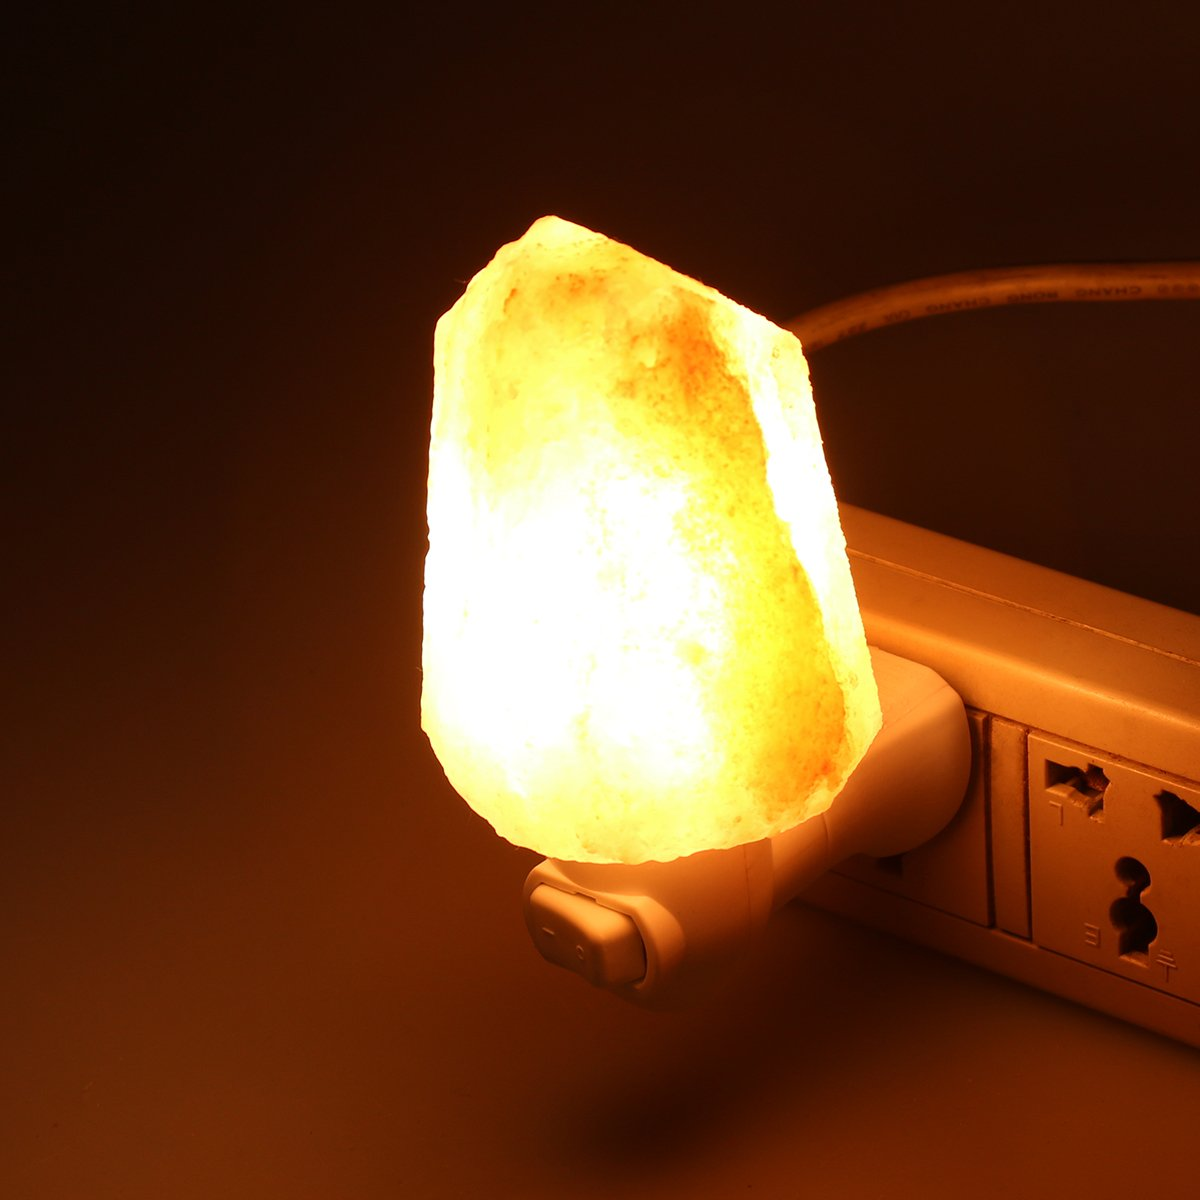 SDlife Salt Lamp Home Decor Night Light With Wall Plug (A)